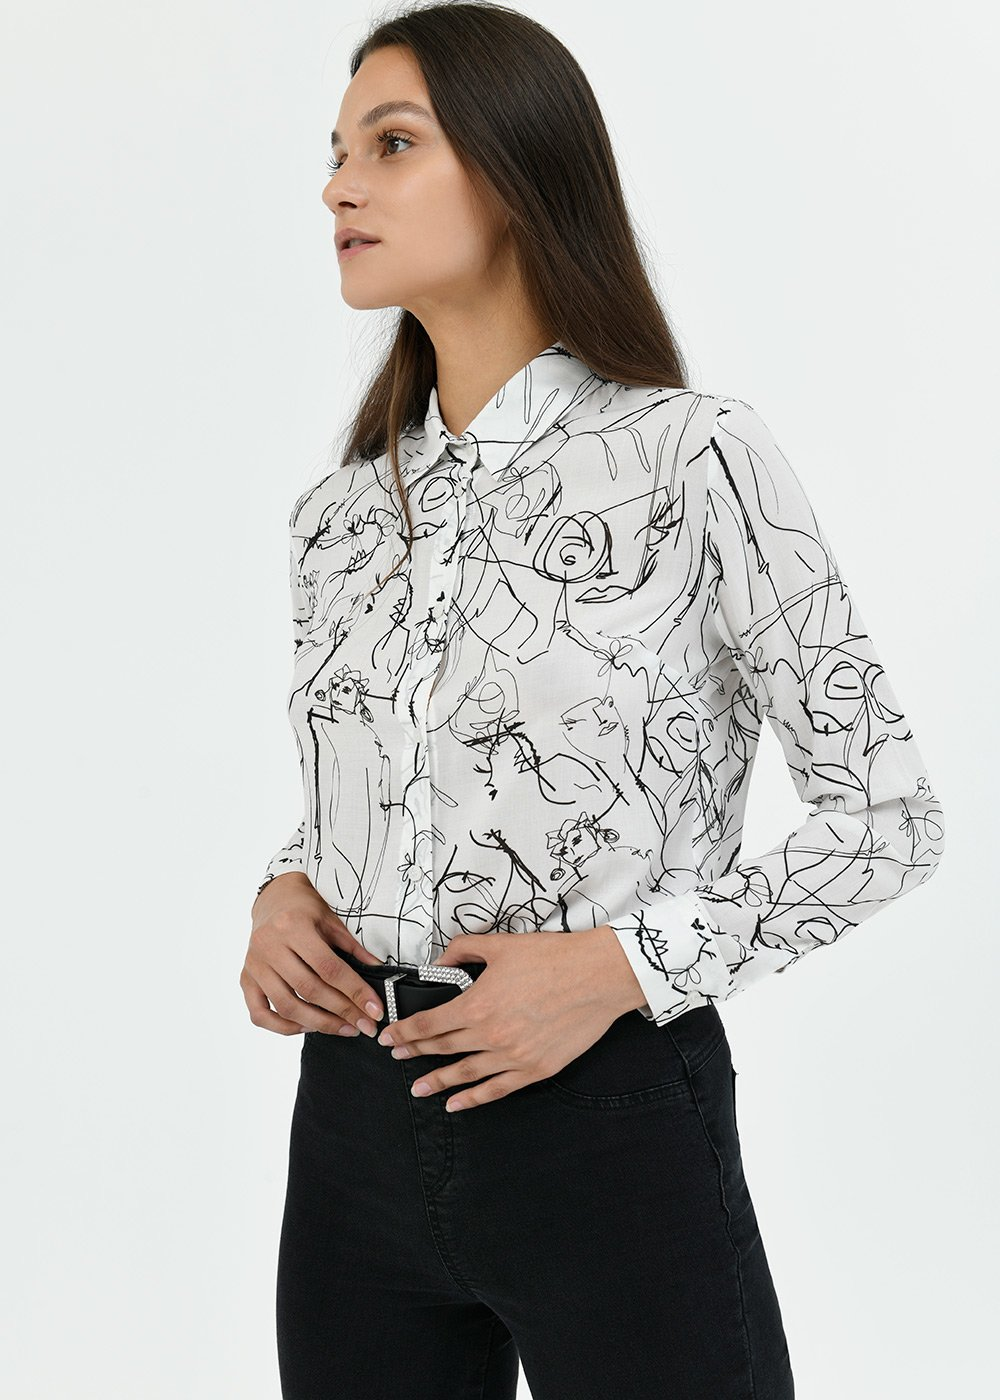 Alessia patterned shirt - White /  Black Fantasia - Woman